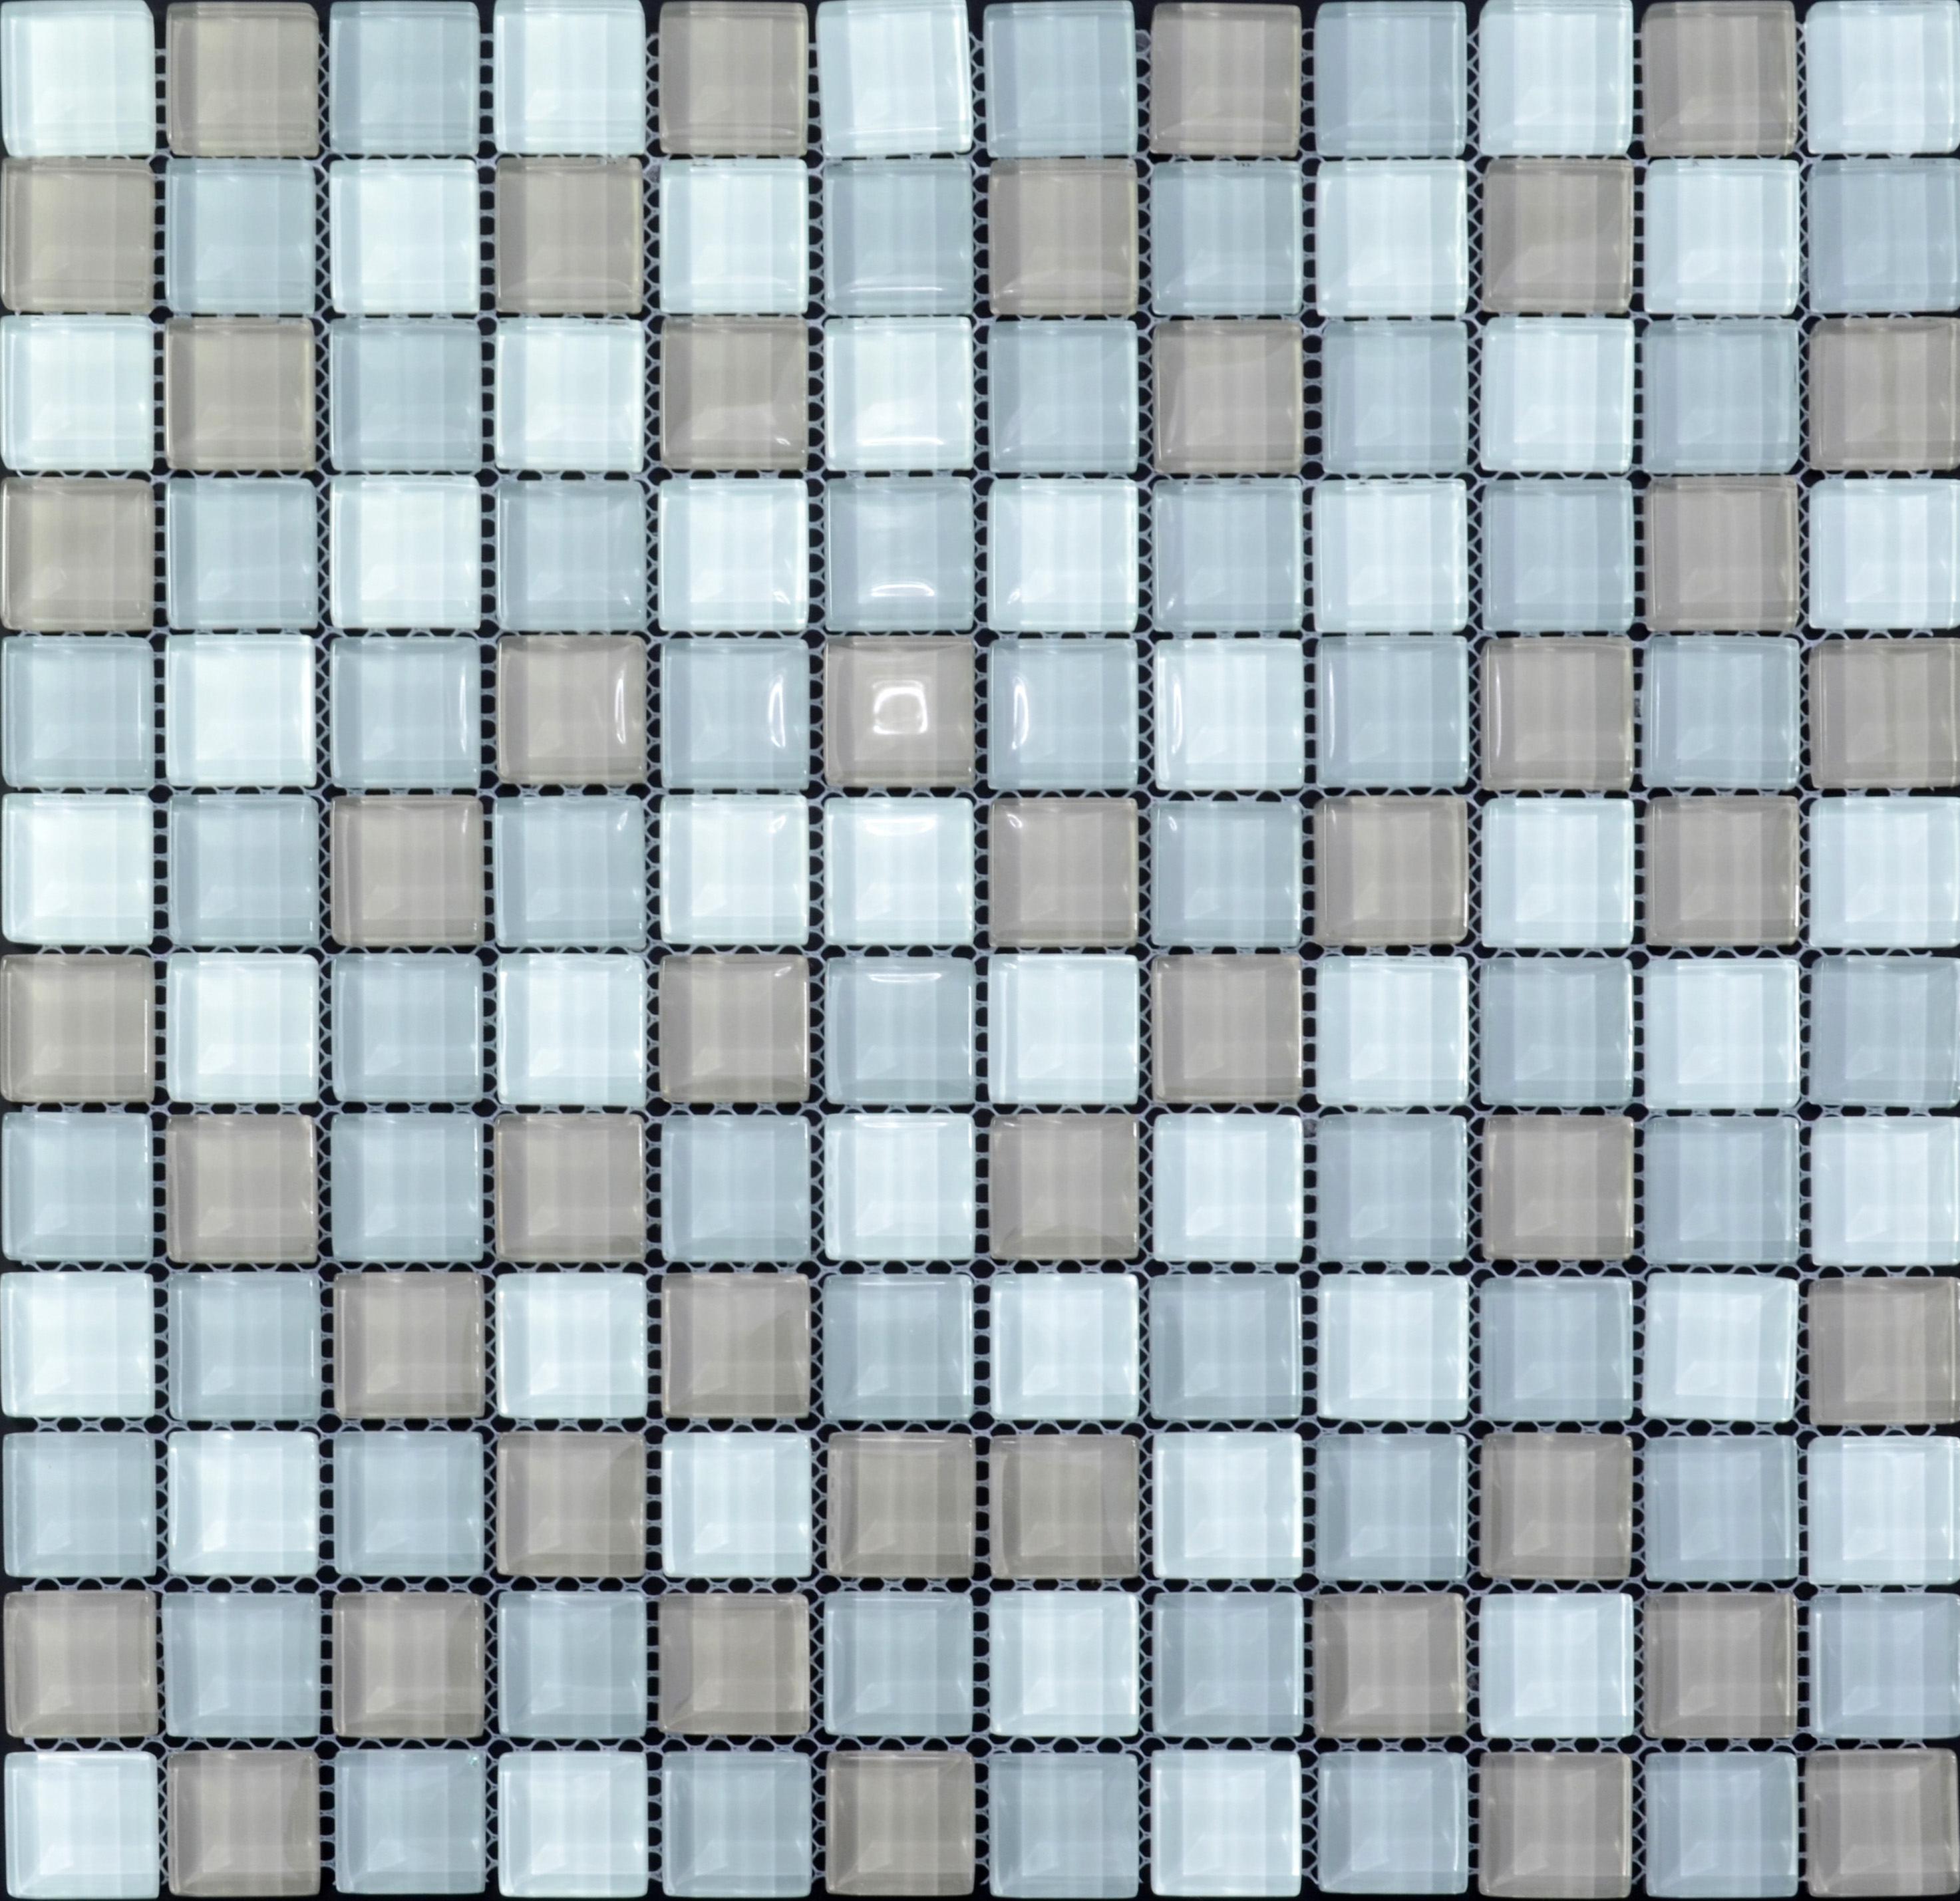 Glass Mosaic Tiles Blacksplash Multi-color Crystal Mosaic Tile | Etsy